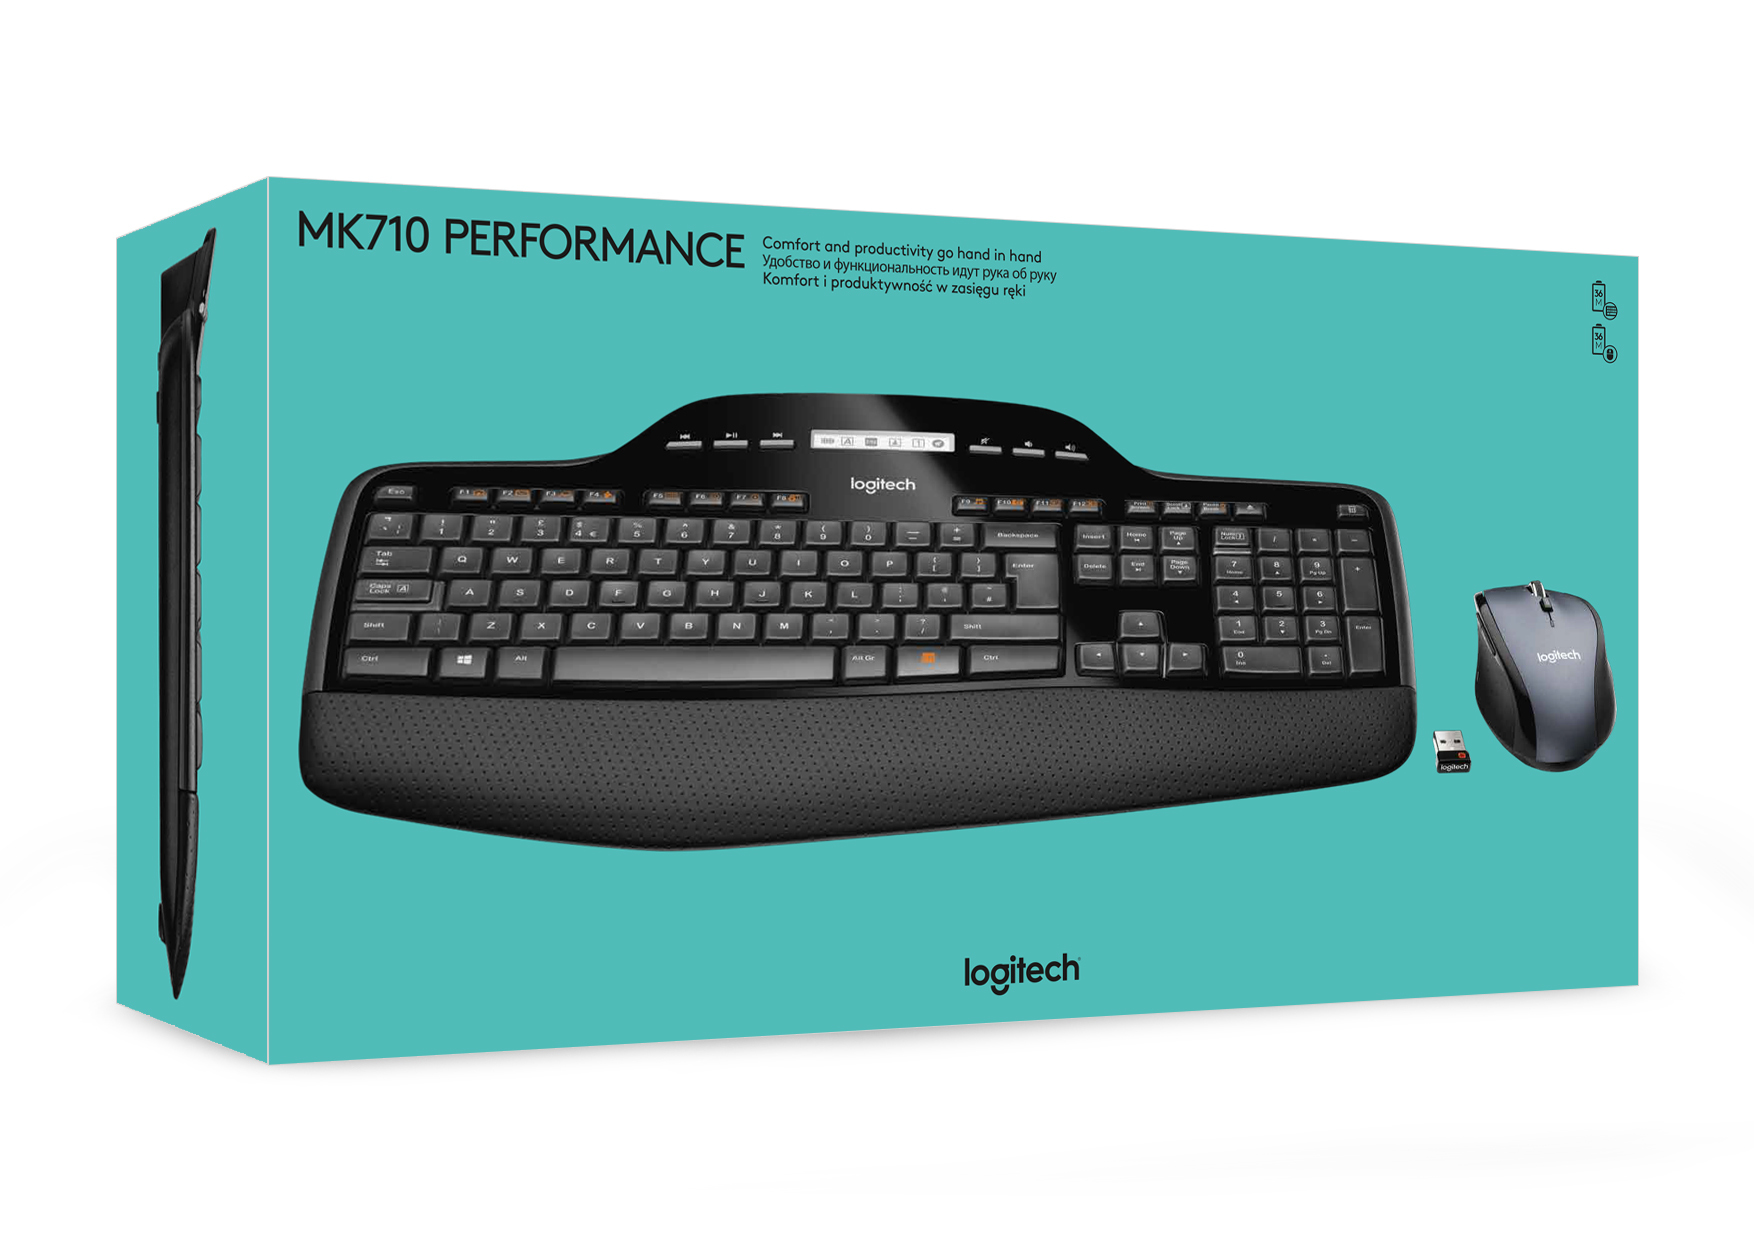 Logitech-920-002420-MK710-RF-Wireless-QWERTZ-German-Black-USB-2-4-GHz